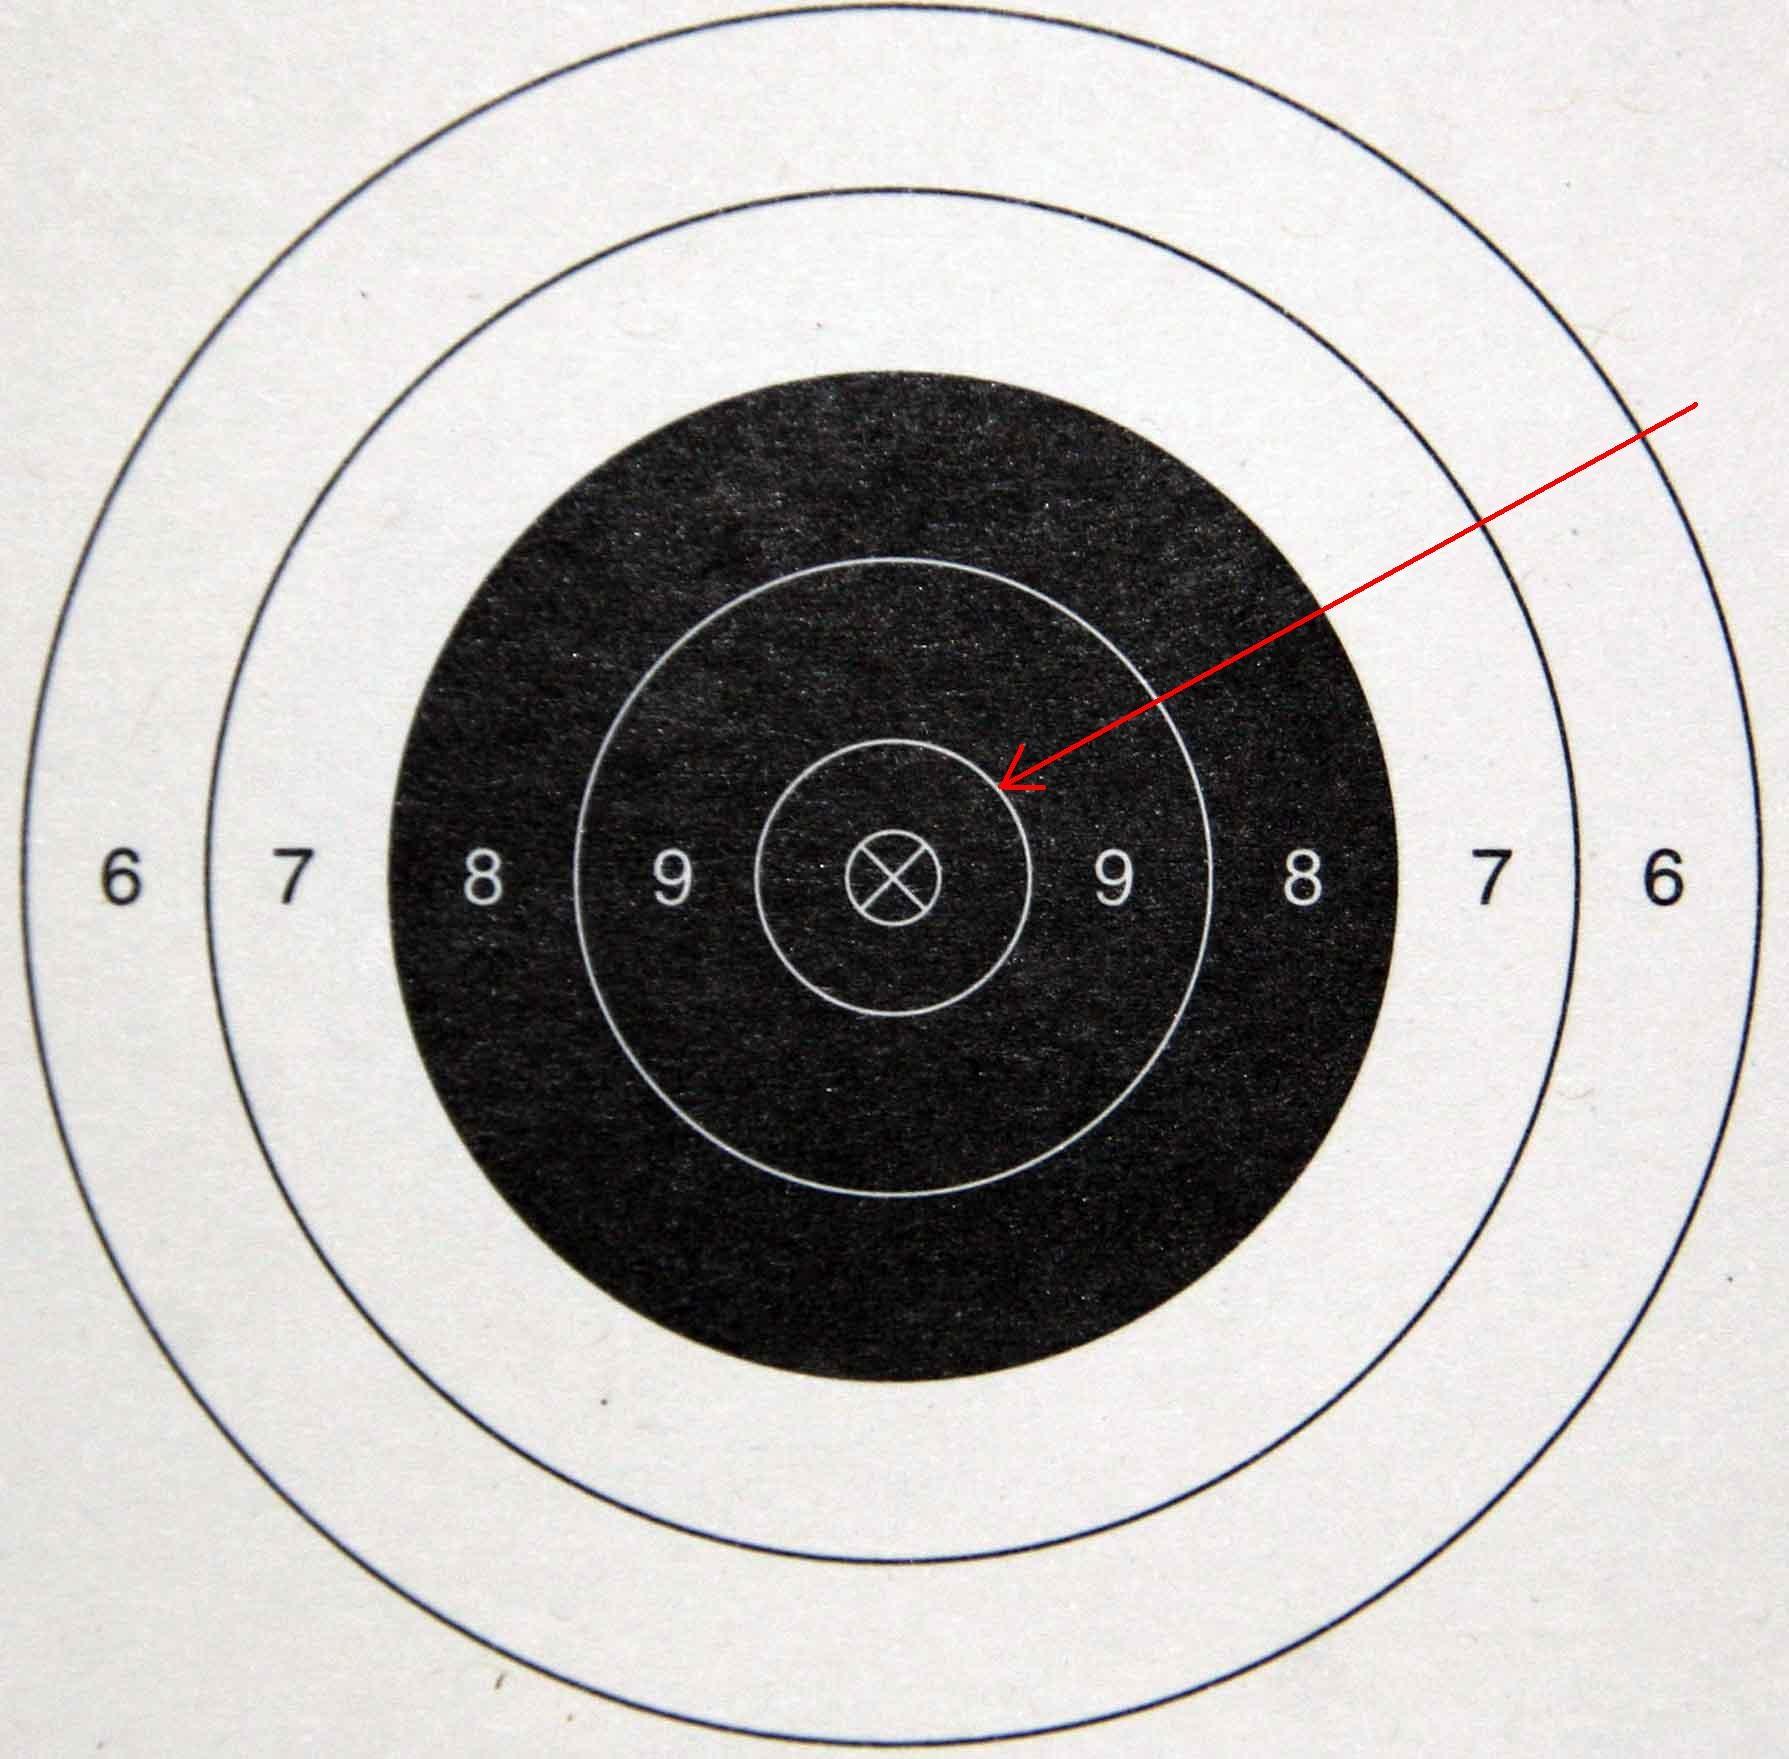 New Page 1 - Free Printable Nra 25 Targets